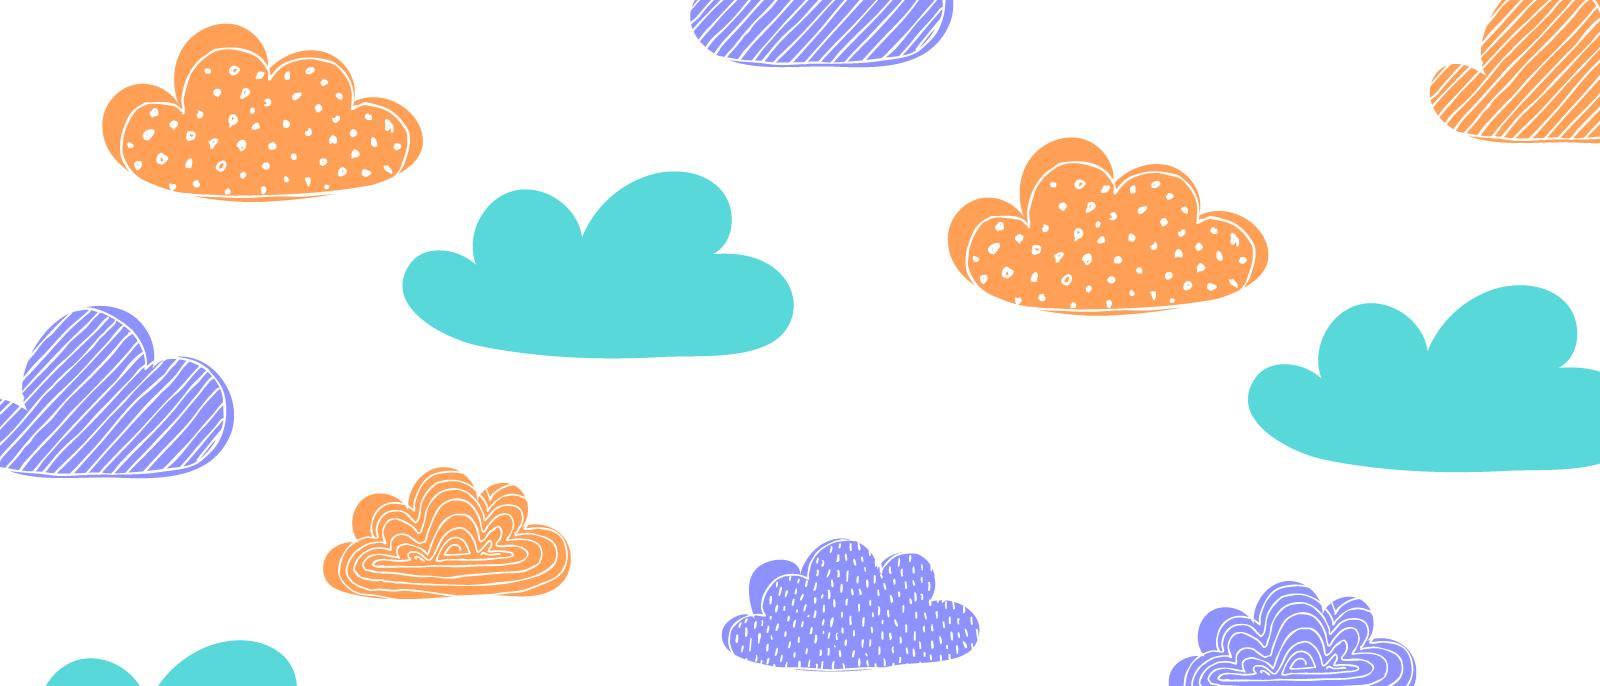 cloud regions